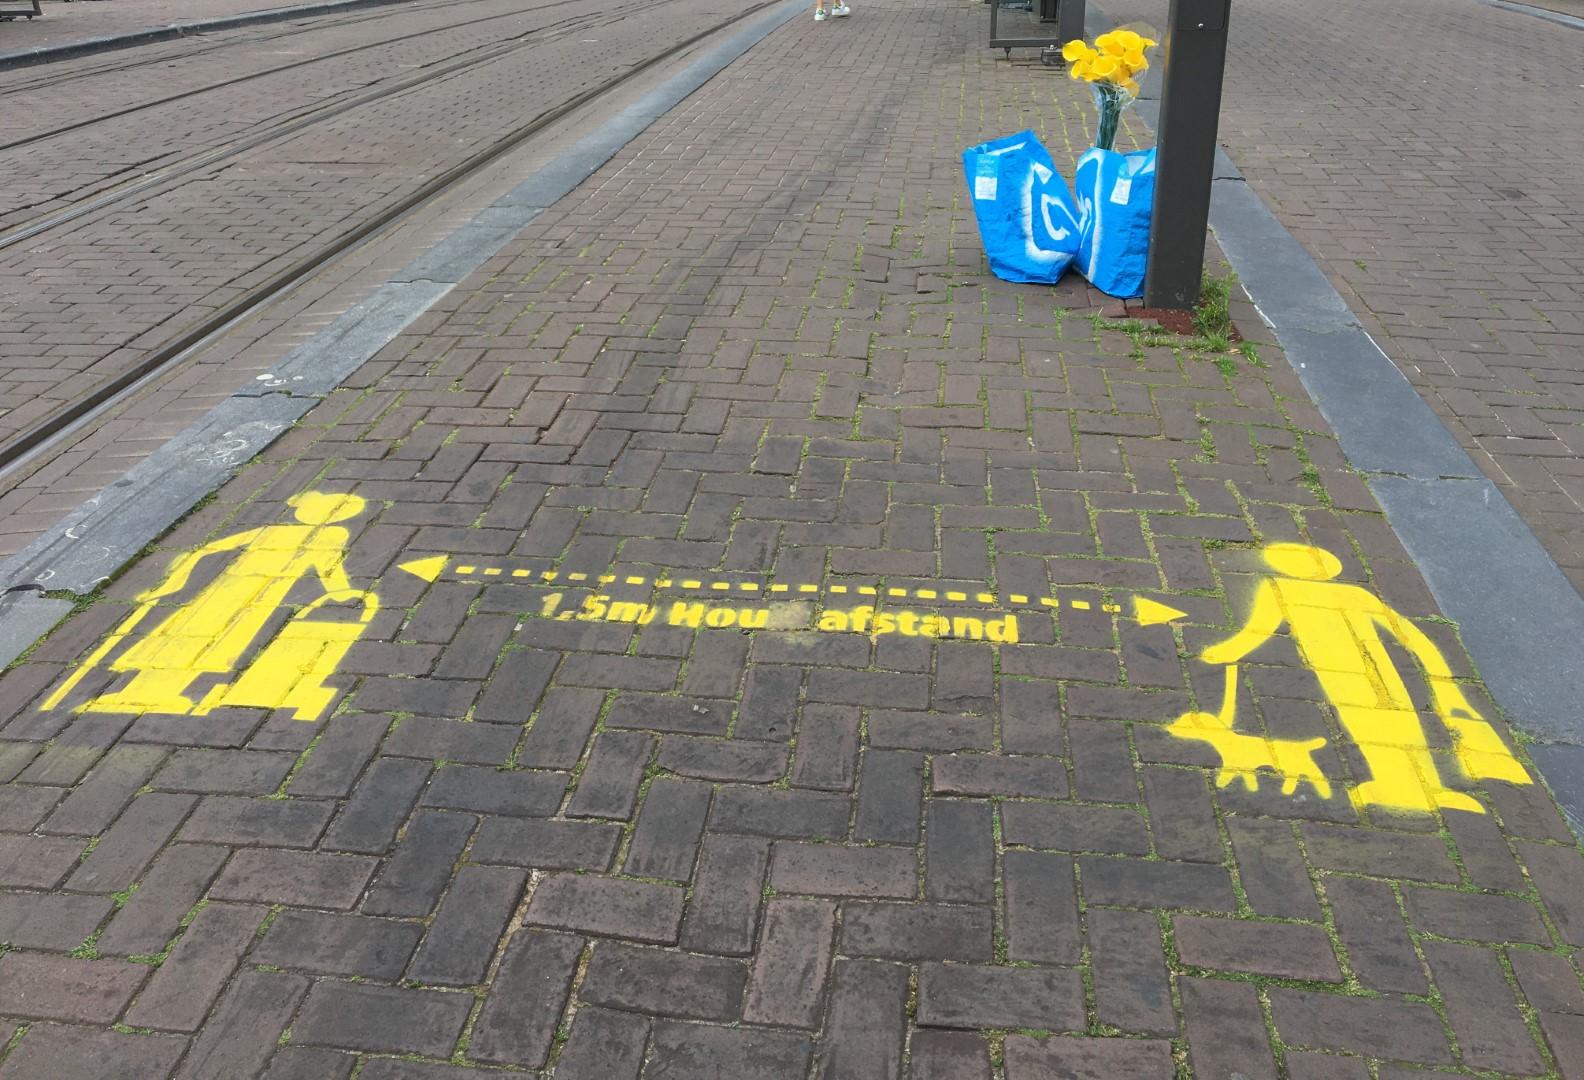 Corona crime report: 15,000 fines - DutchNews.nl